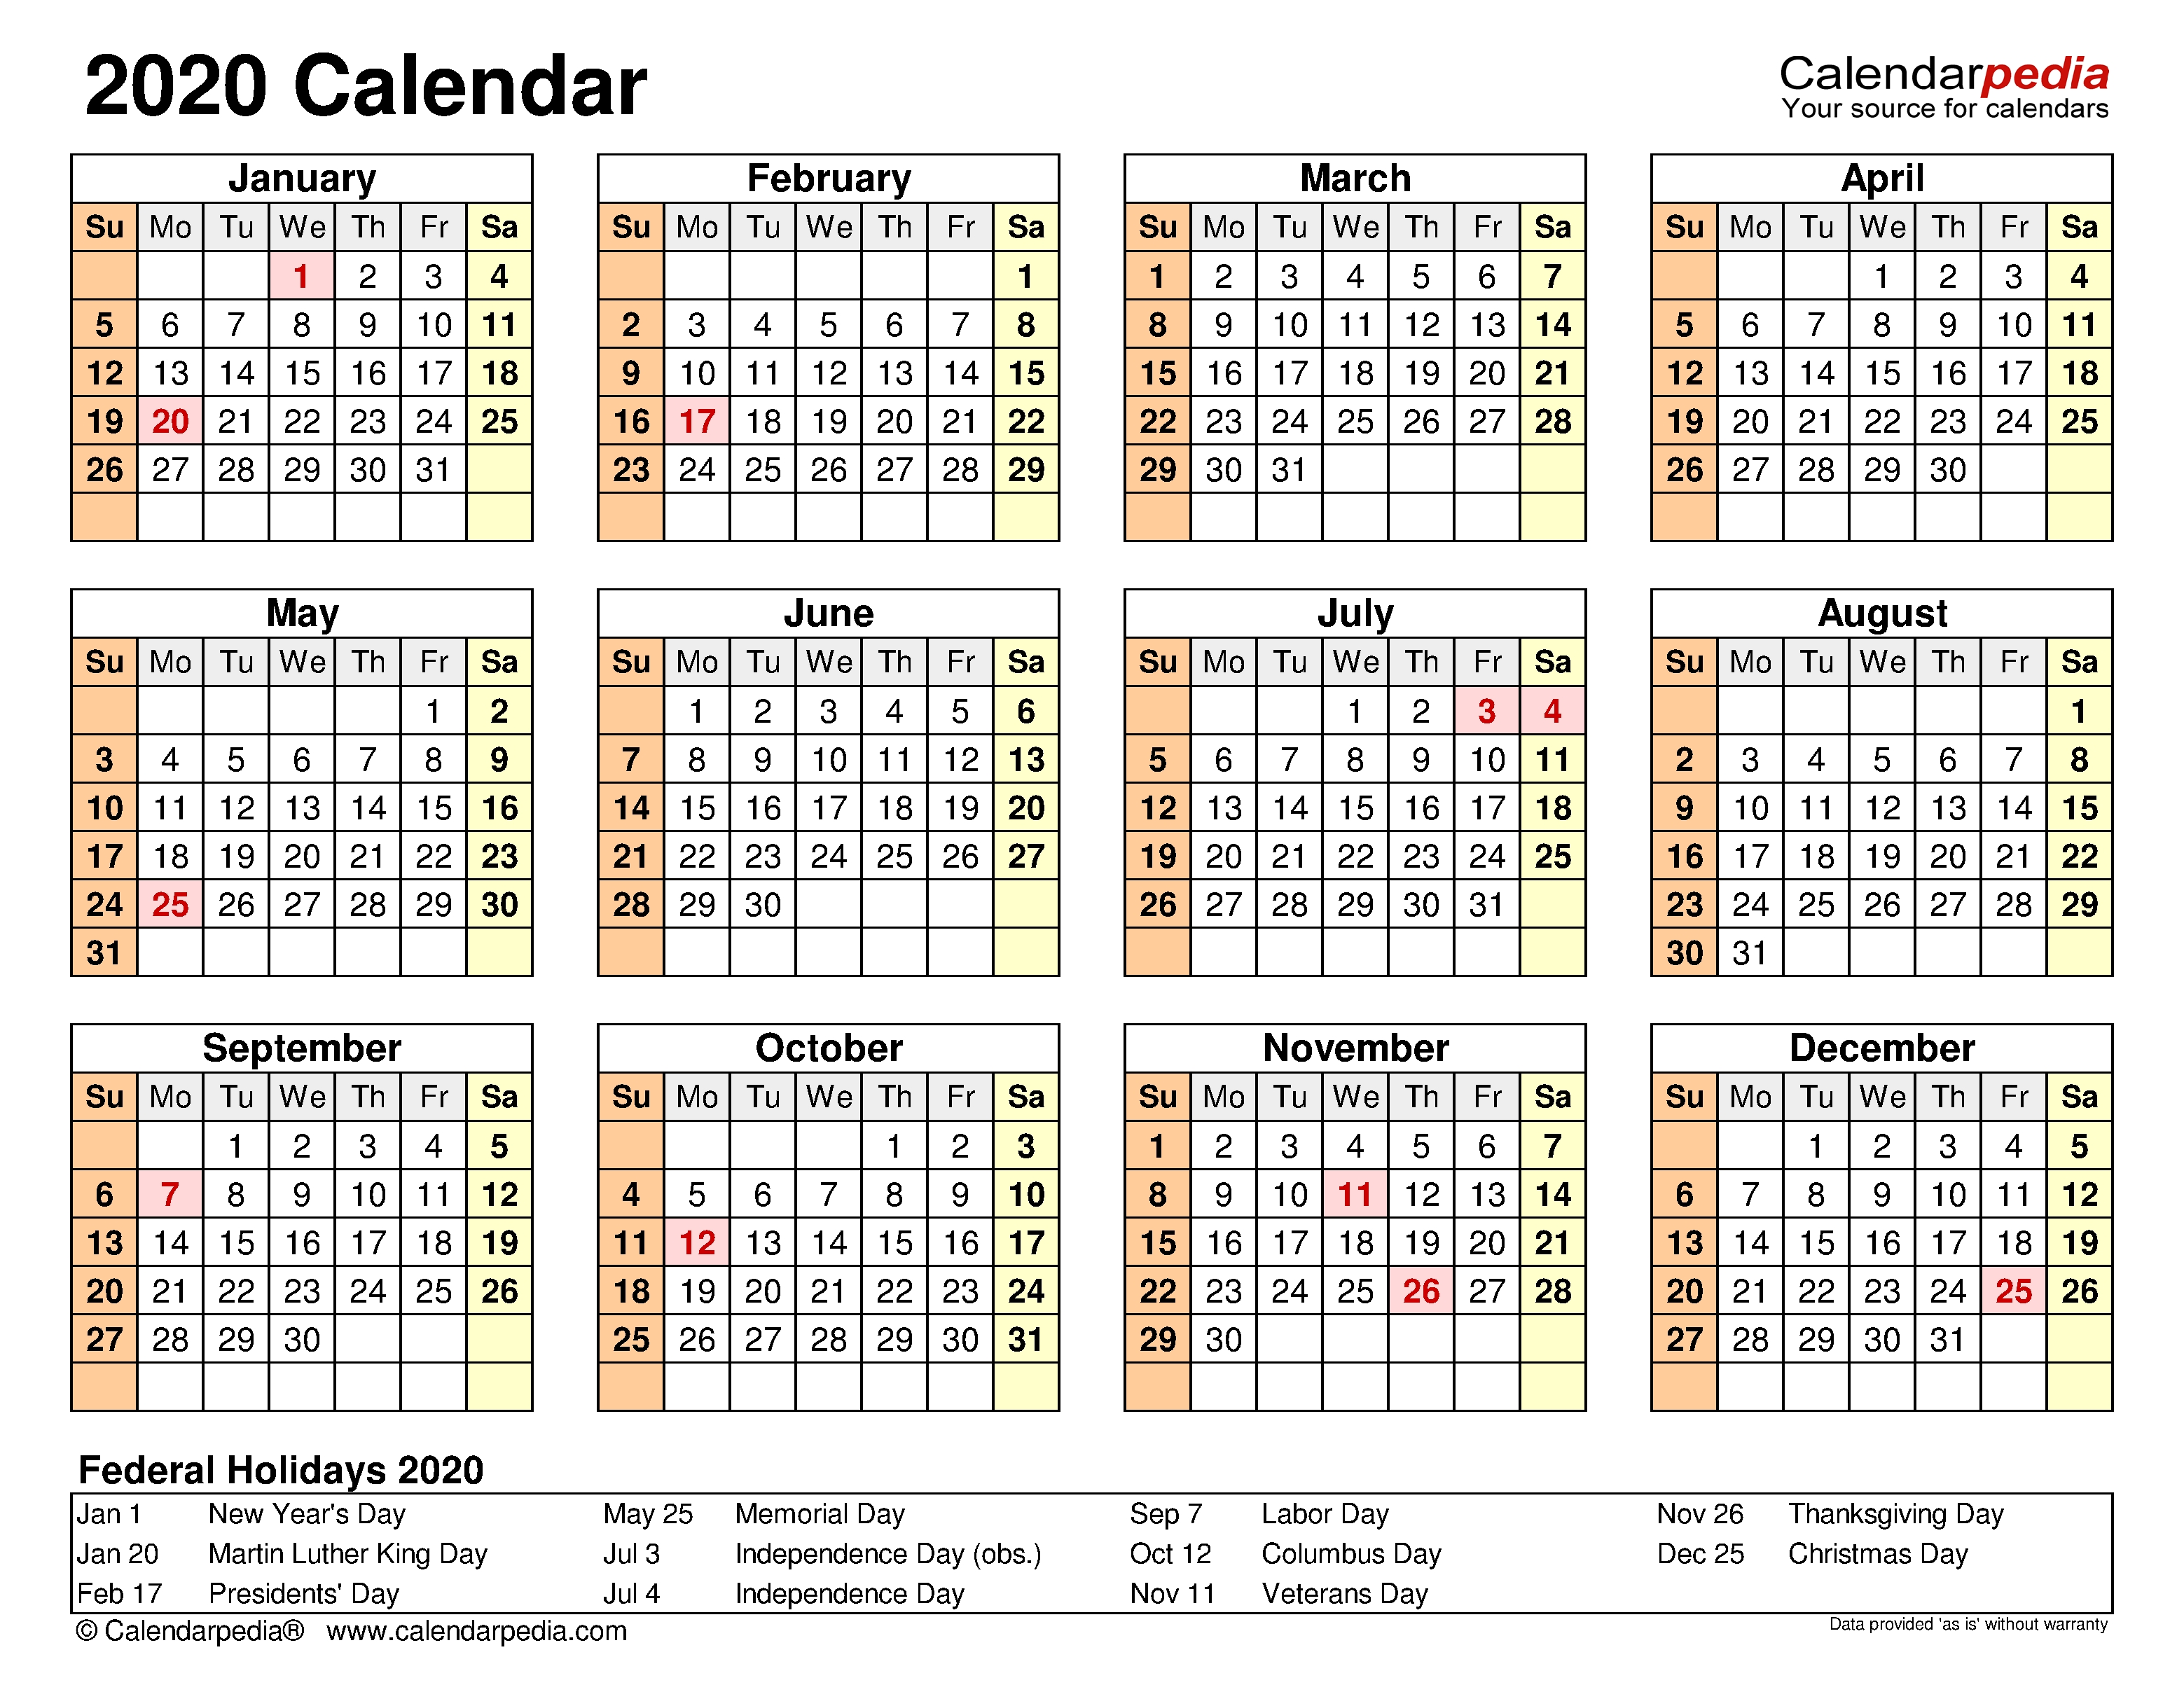 2020 Calendar - Free Printable Microsoft Word Templates-2020 Calendar Template Ms Word